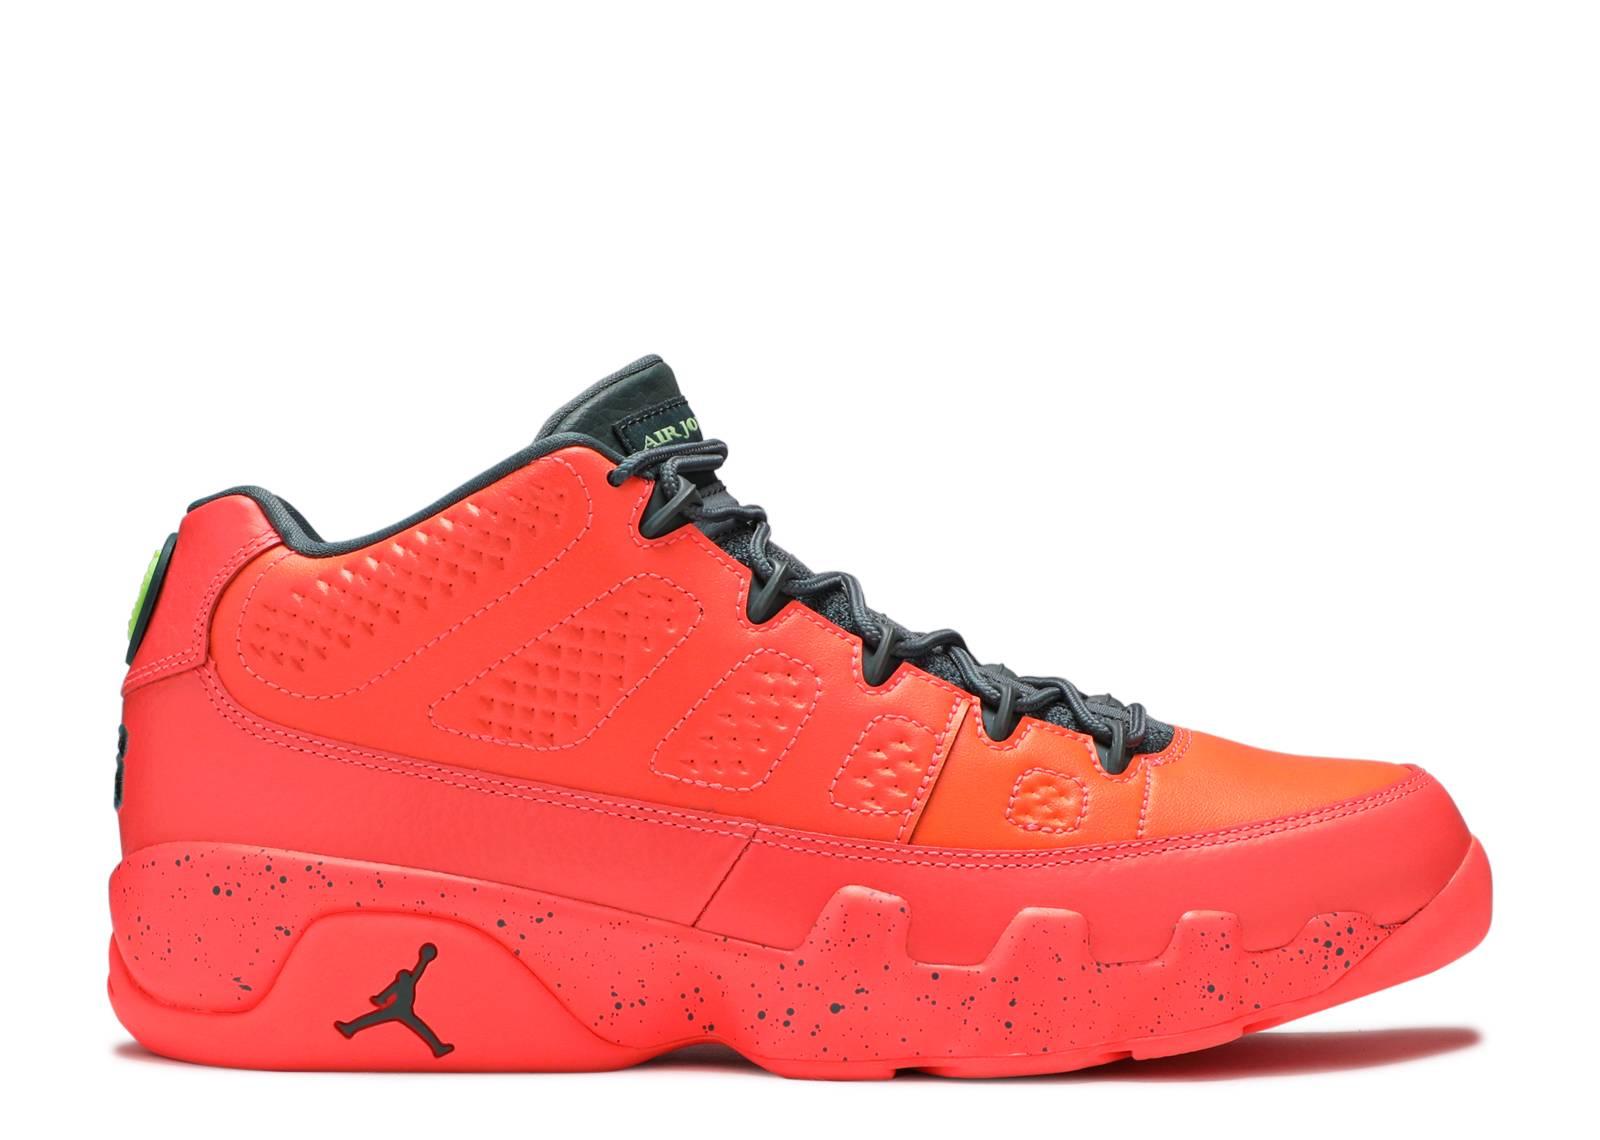 Factory Sale Mens Basketball Shoes - Nike Air Jordan Retro 9 Low Light Mango/Green